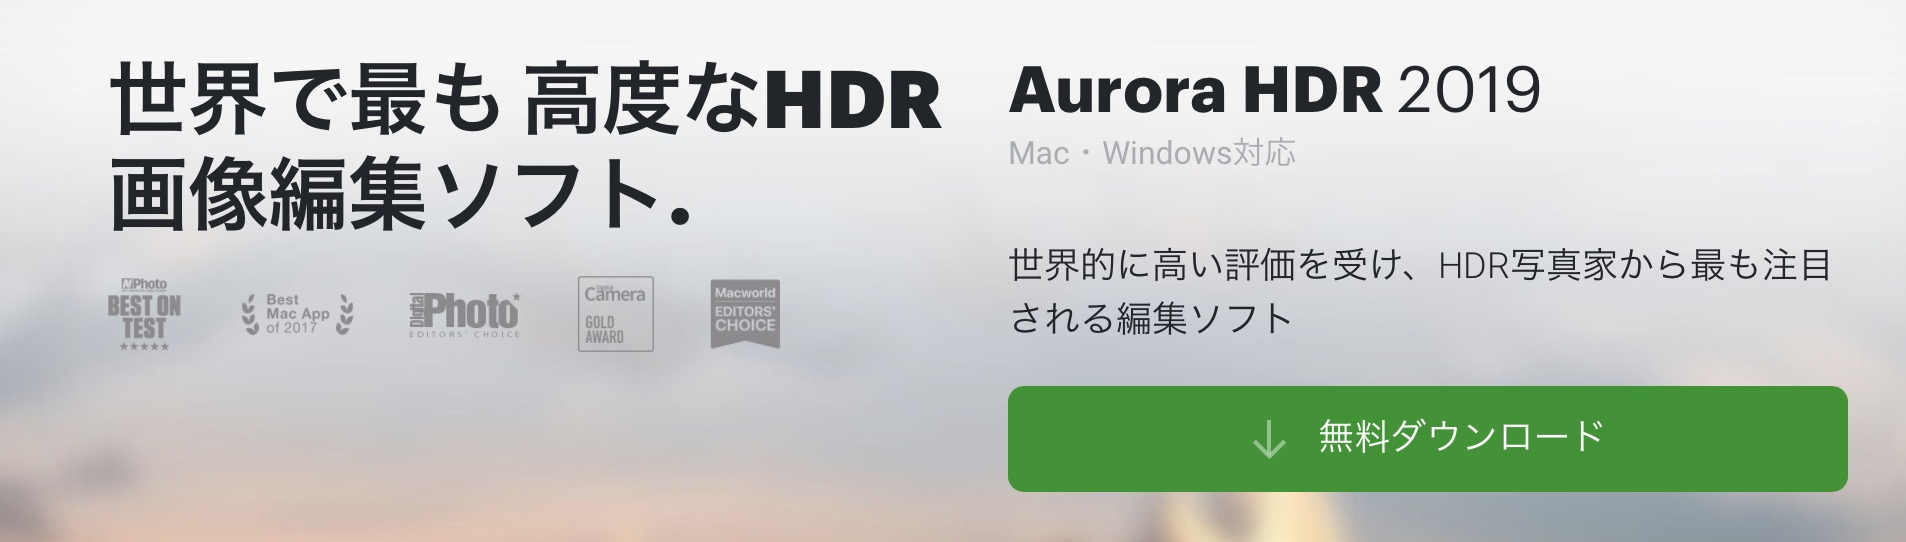 1290f77eb5afea04046e35fb79c06a92 - 当サイトに寄せられたLuminar・Aurora HDRに関する問い合わせ